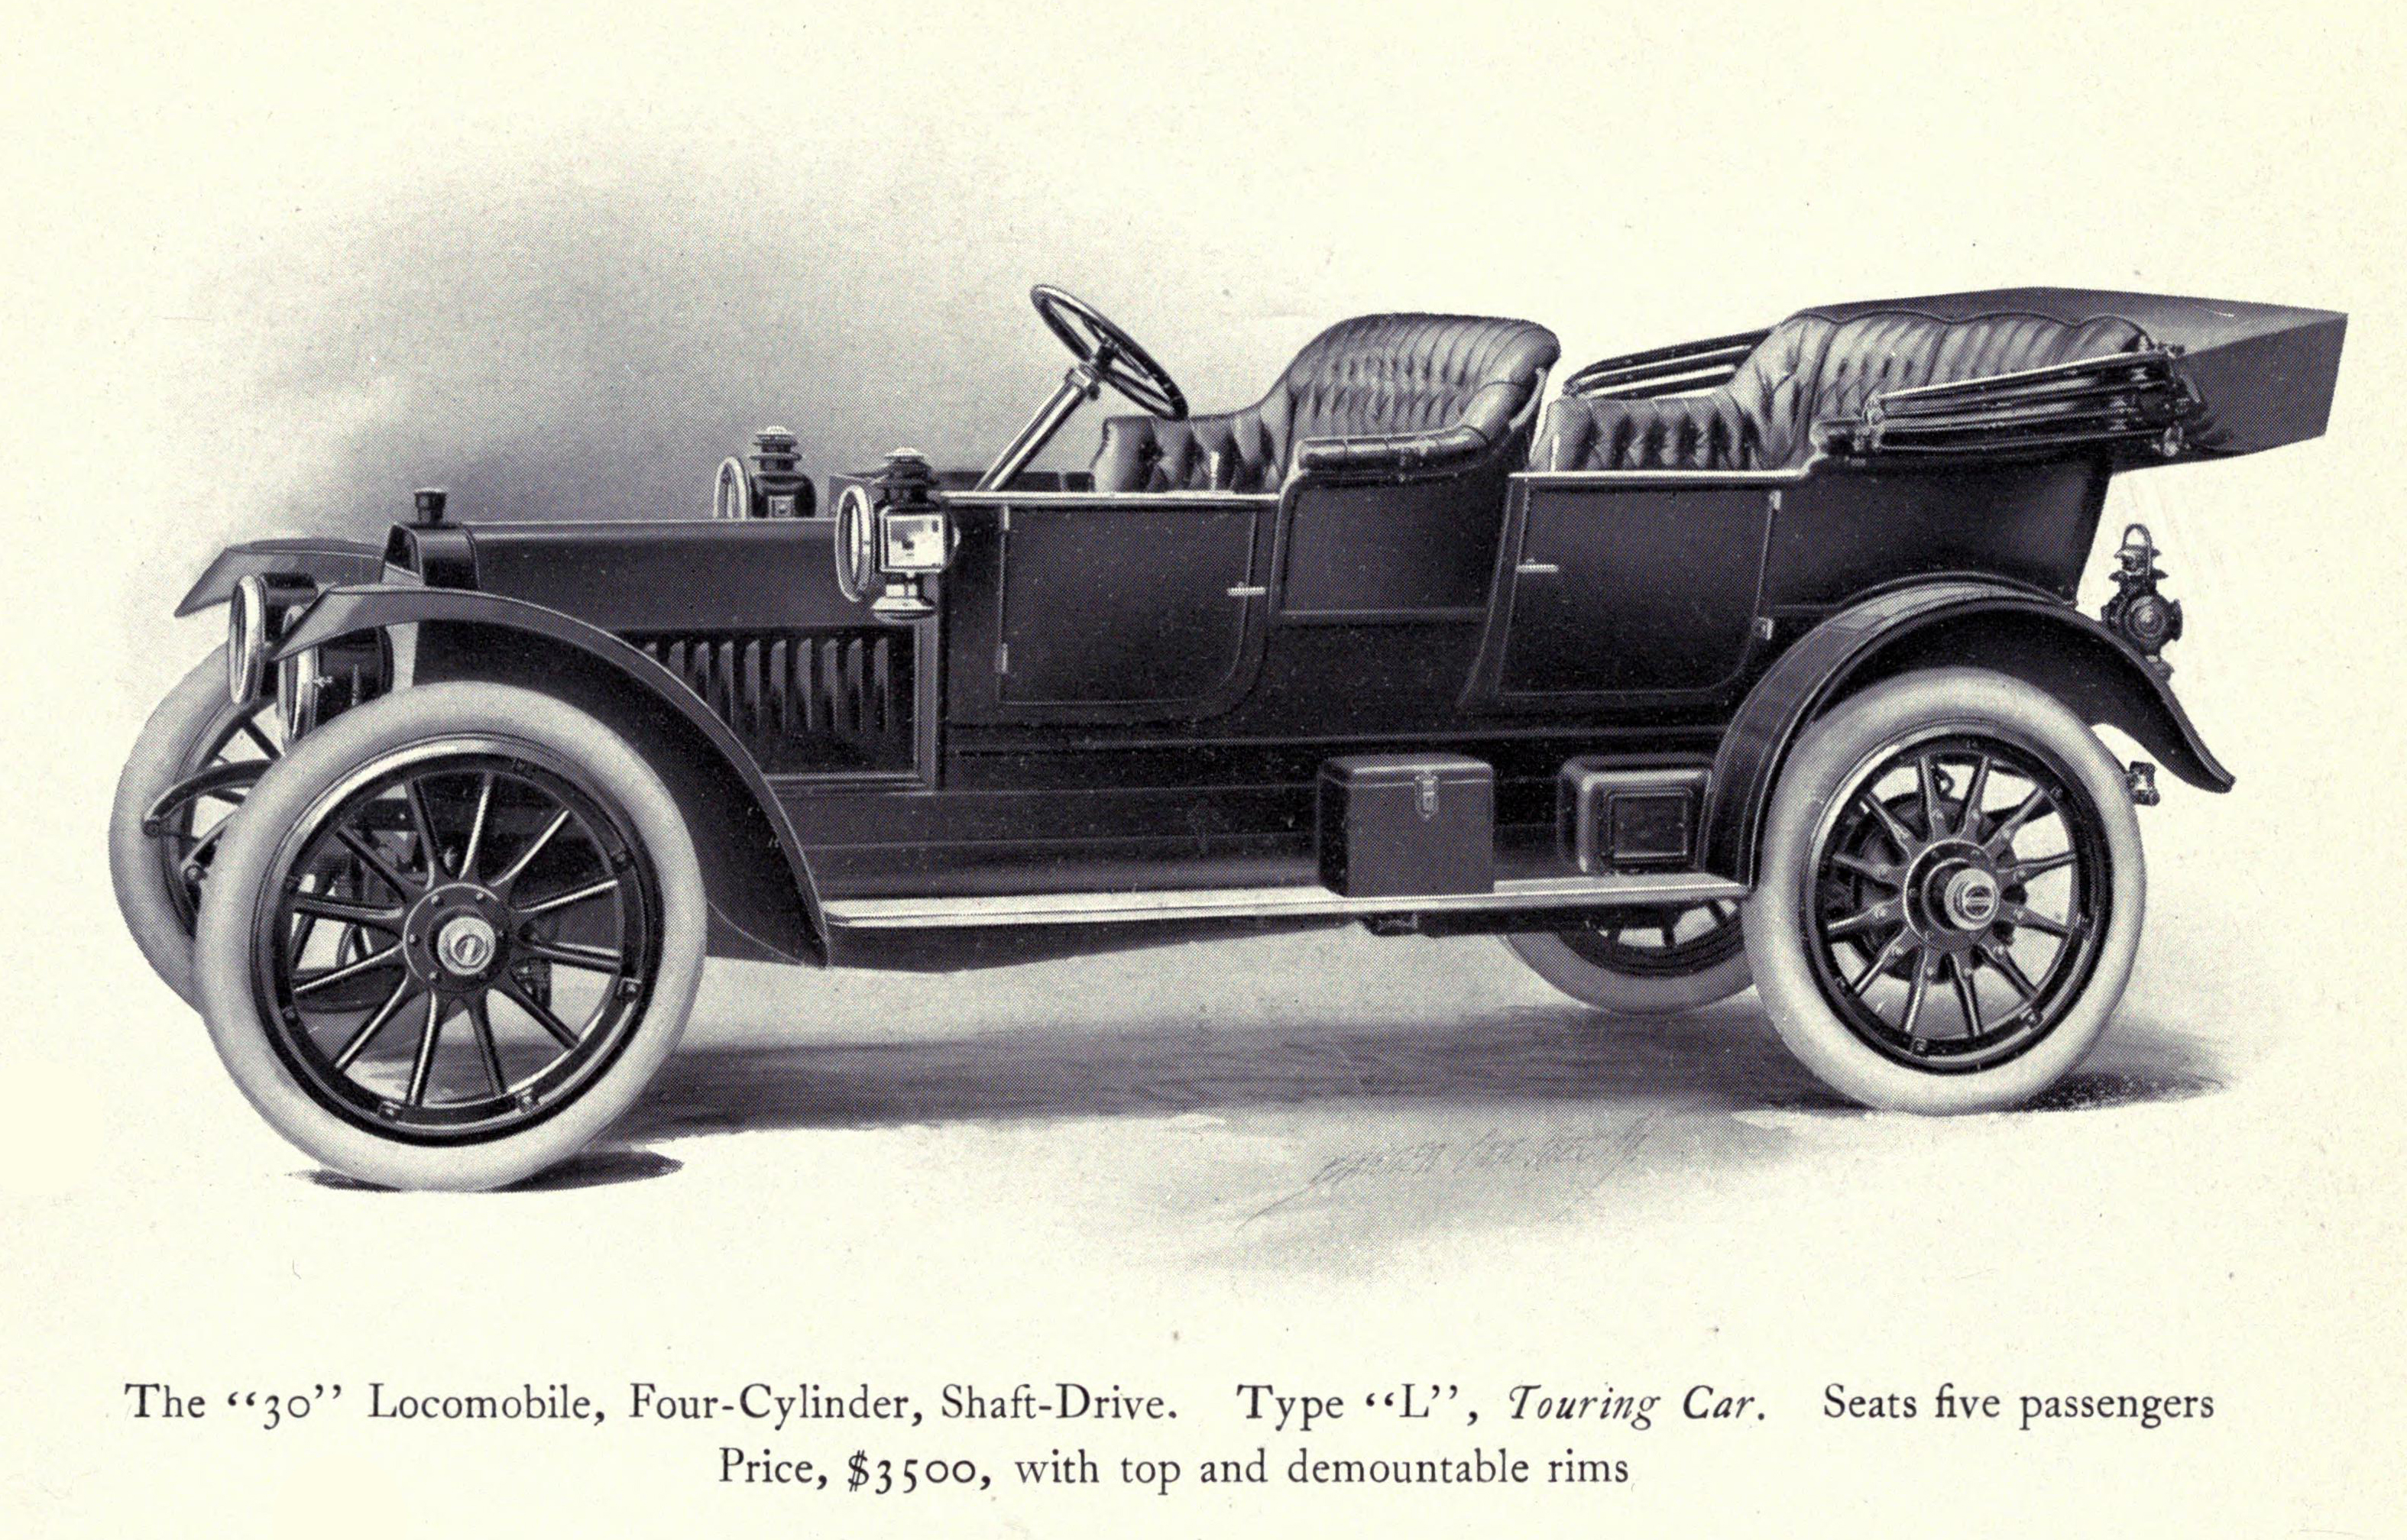 Model 30 Type L Touring Car Illustration - Locomobile Co 1912 -